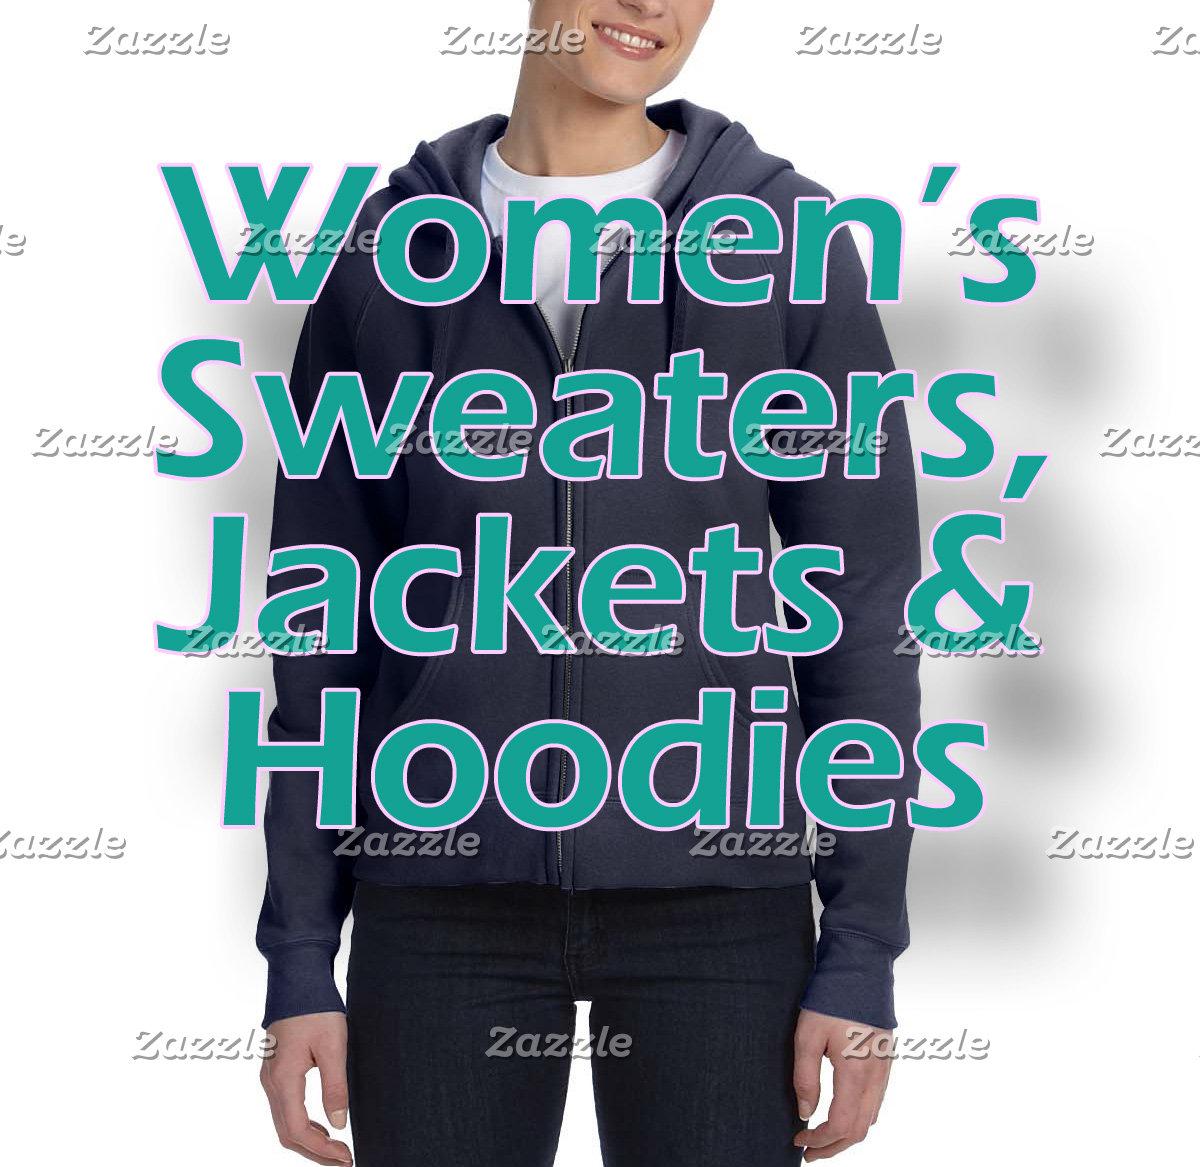 Sweaters, Jackets & Hoodies